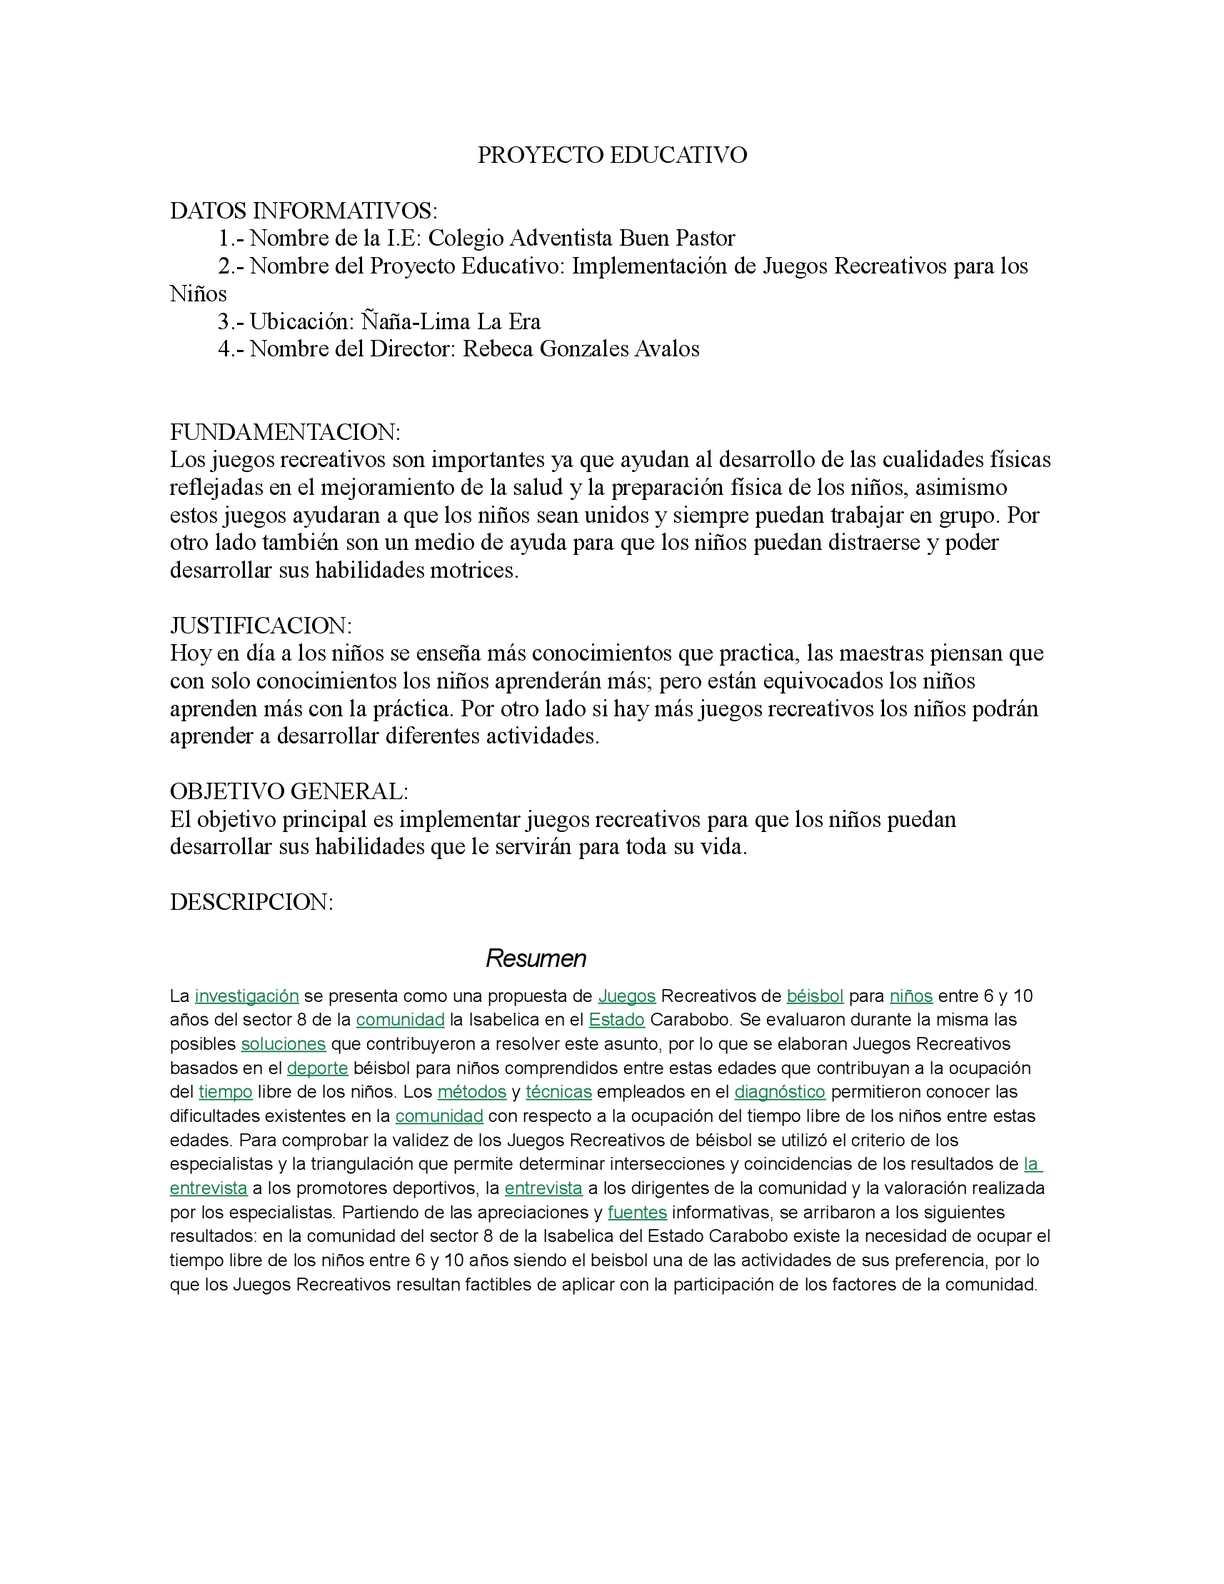 Calameo Proyecto Educativo Implementacion De Juegos Recreativos